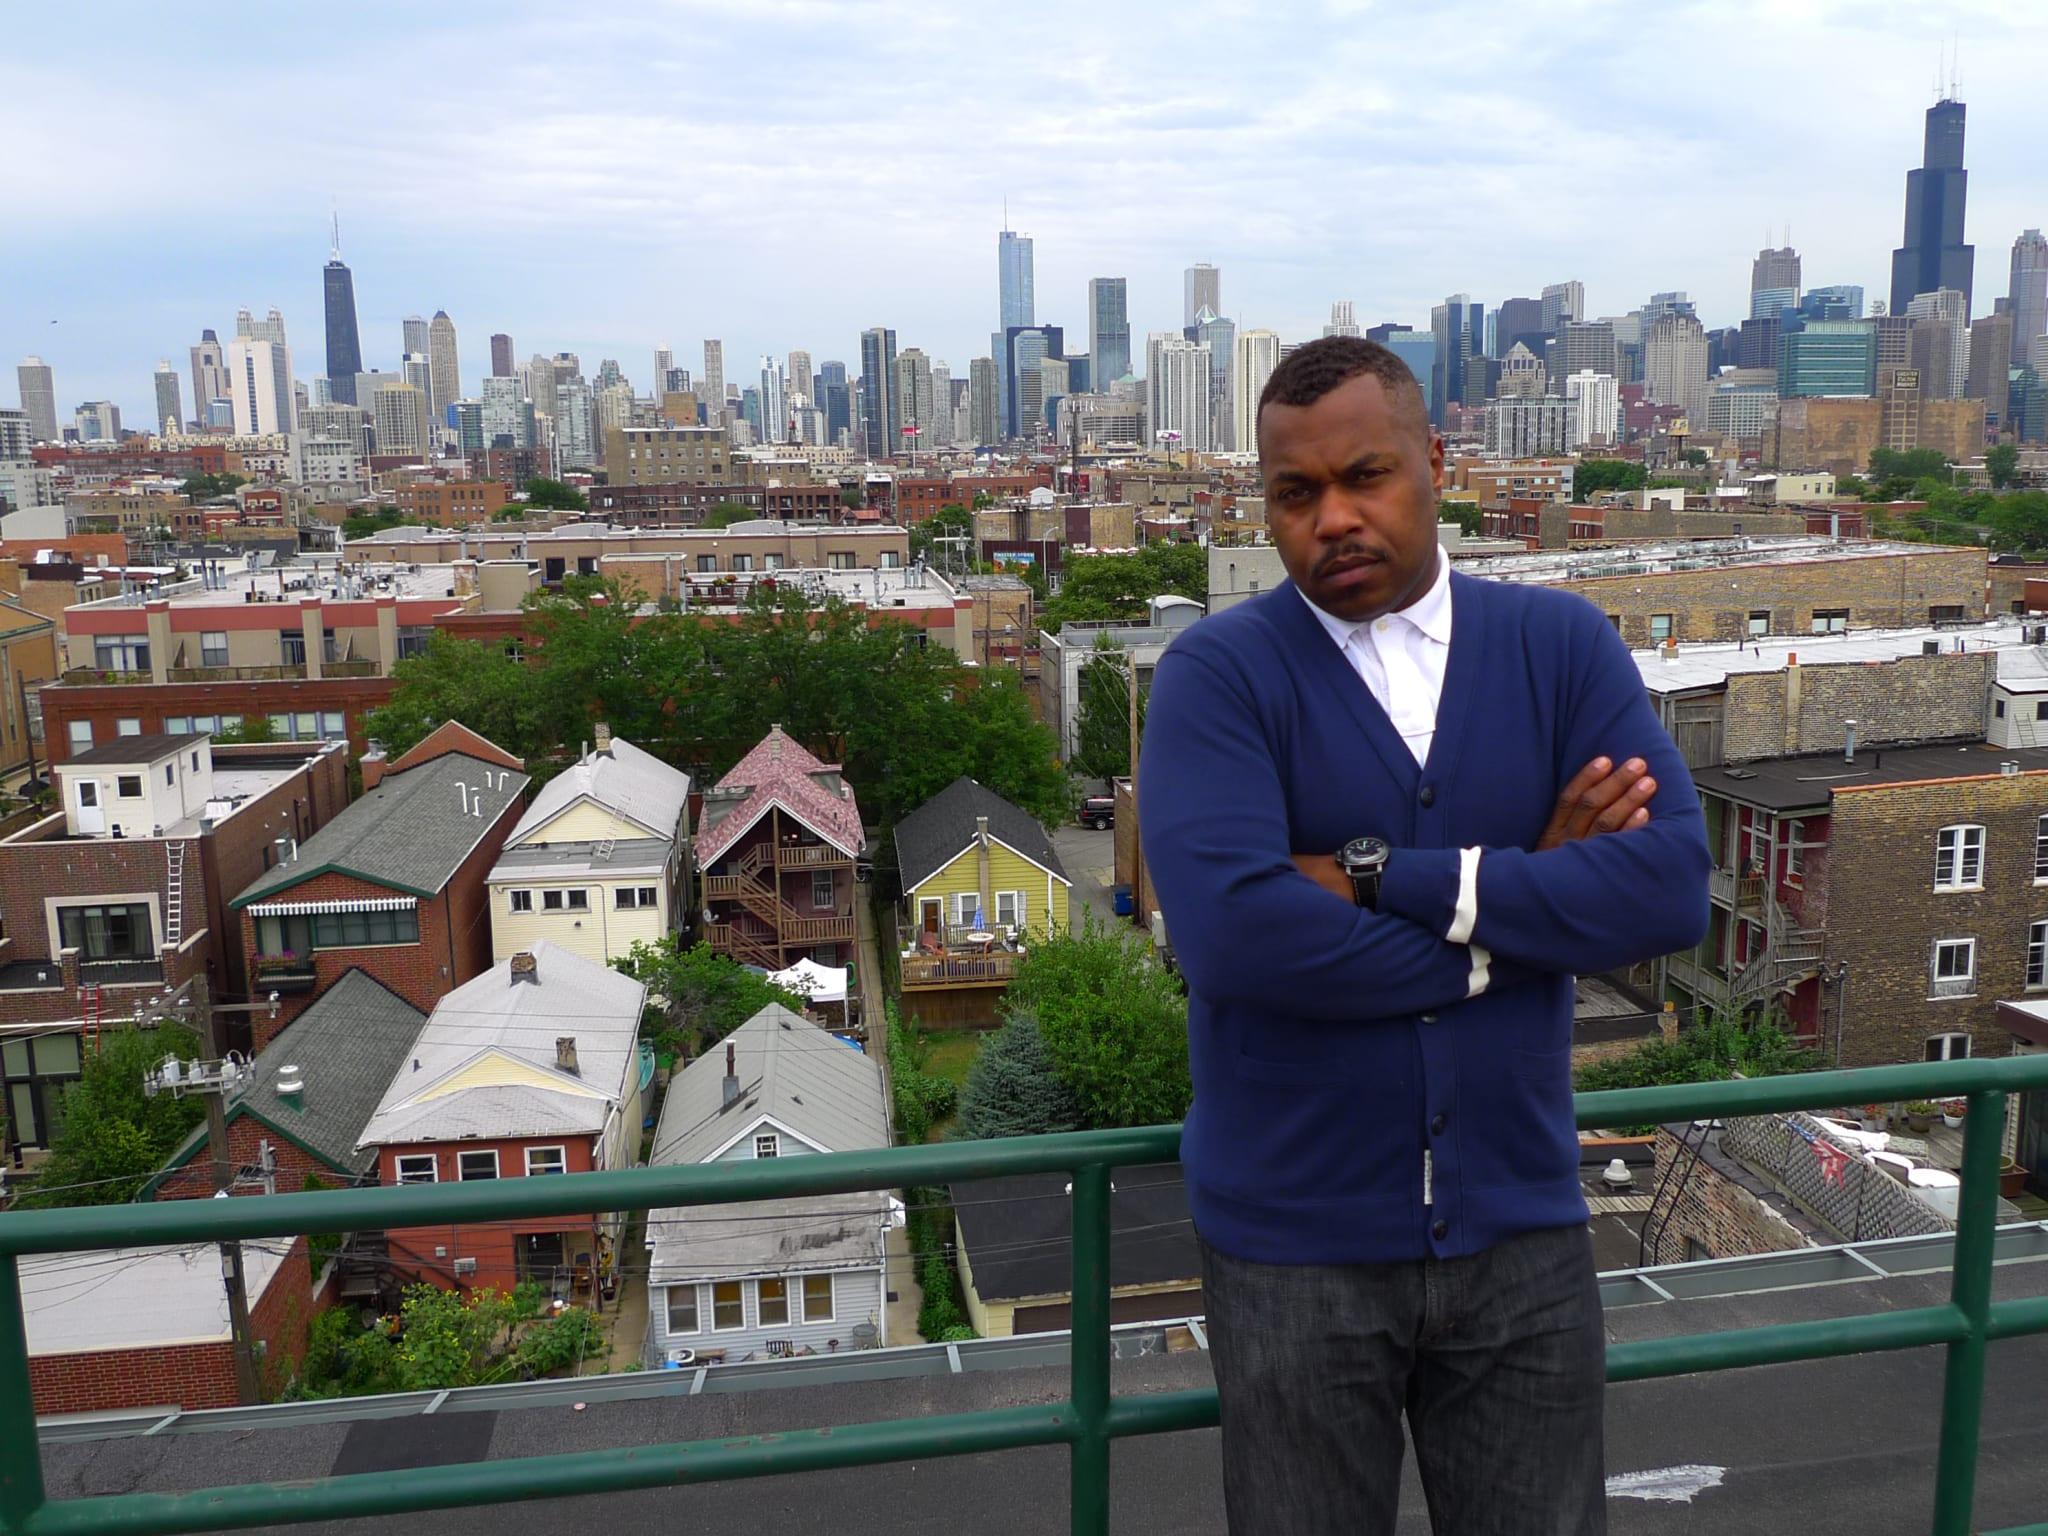 man on roof against city skyline